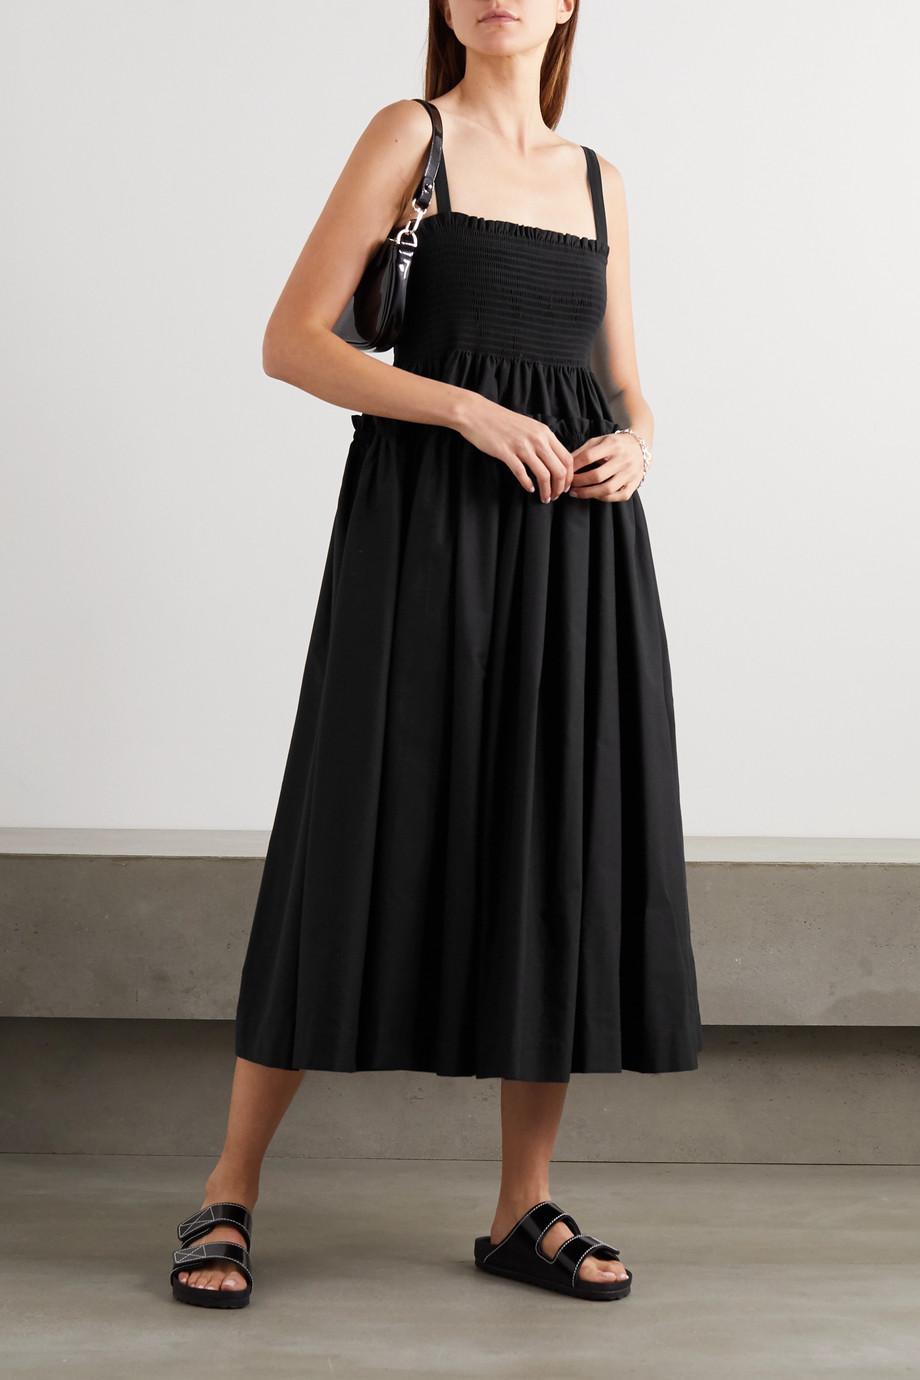 Molly Goddard Marlene 平行绉缝分层式纯棉中长连衣裙